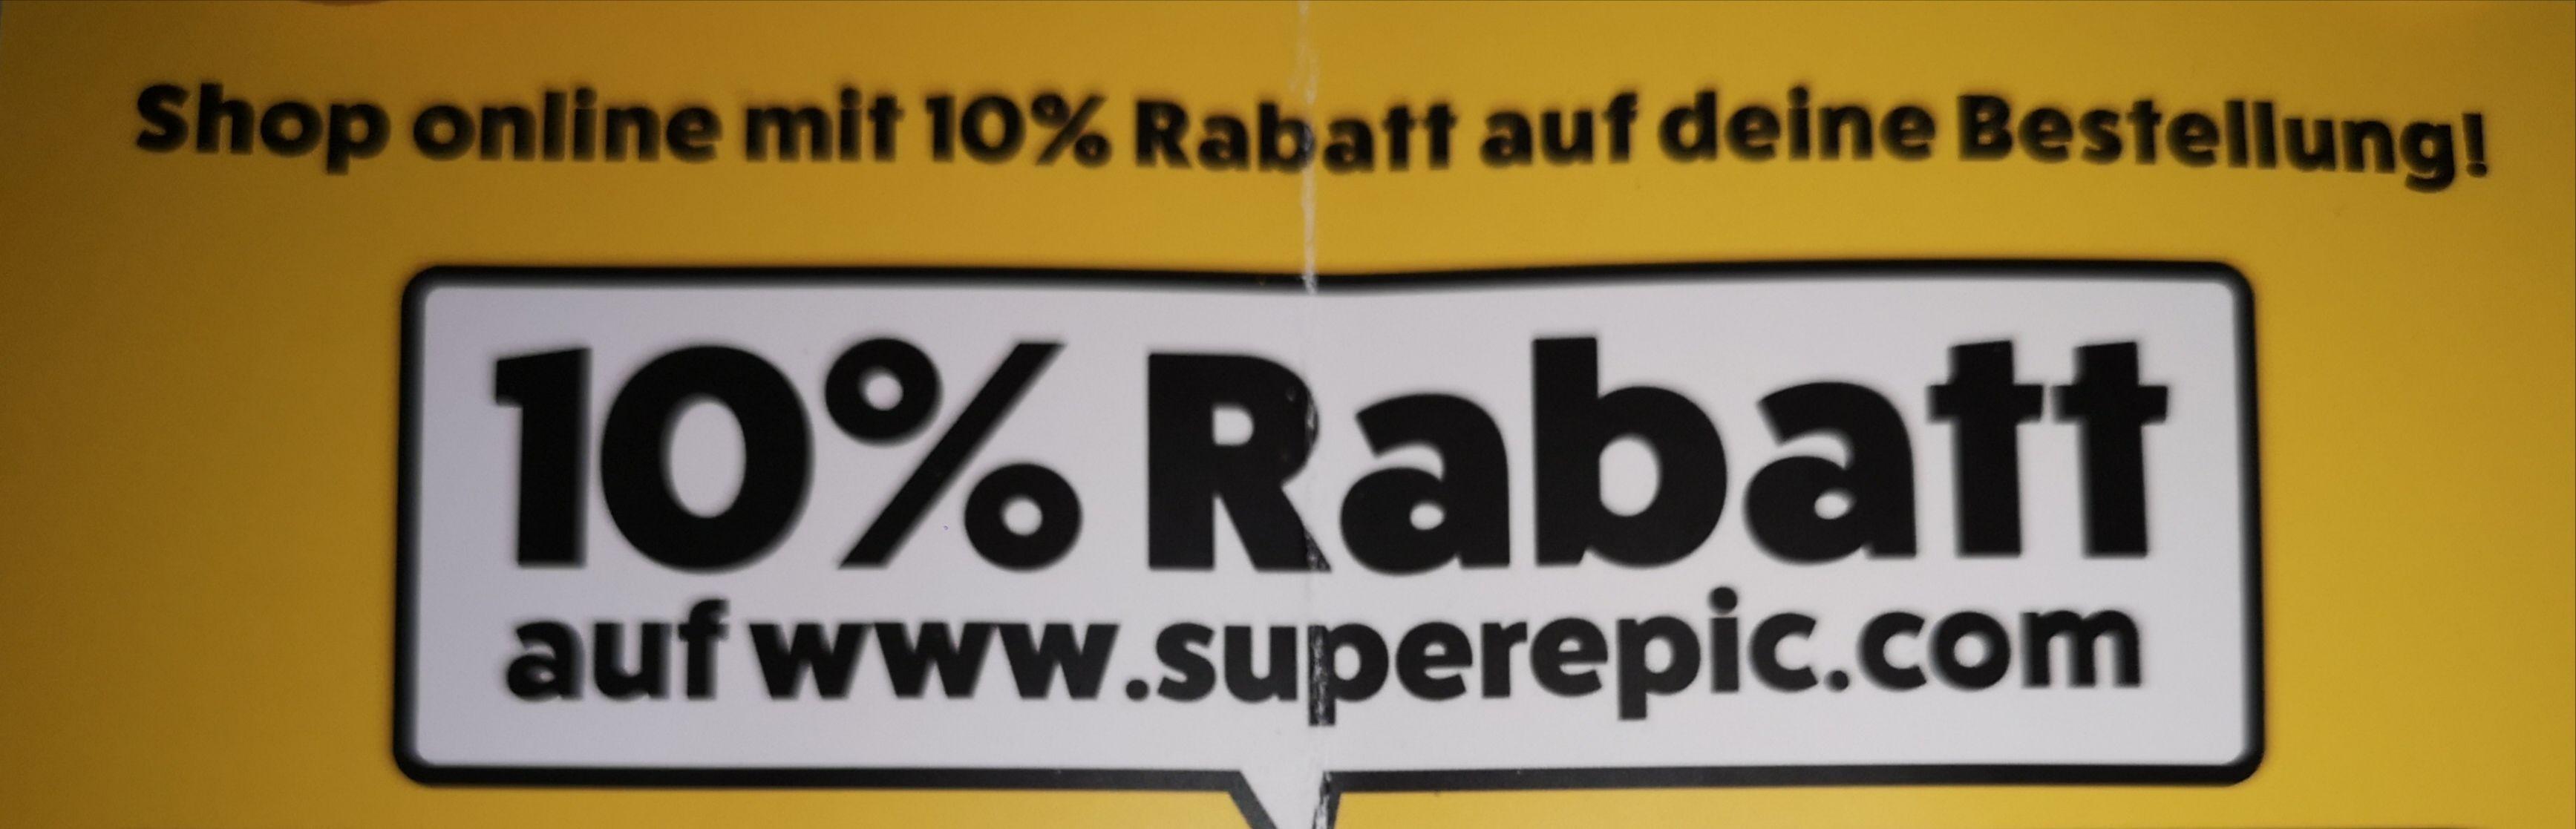 SuperEpic.com: 10% auf Bestellung OHNE MBW